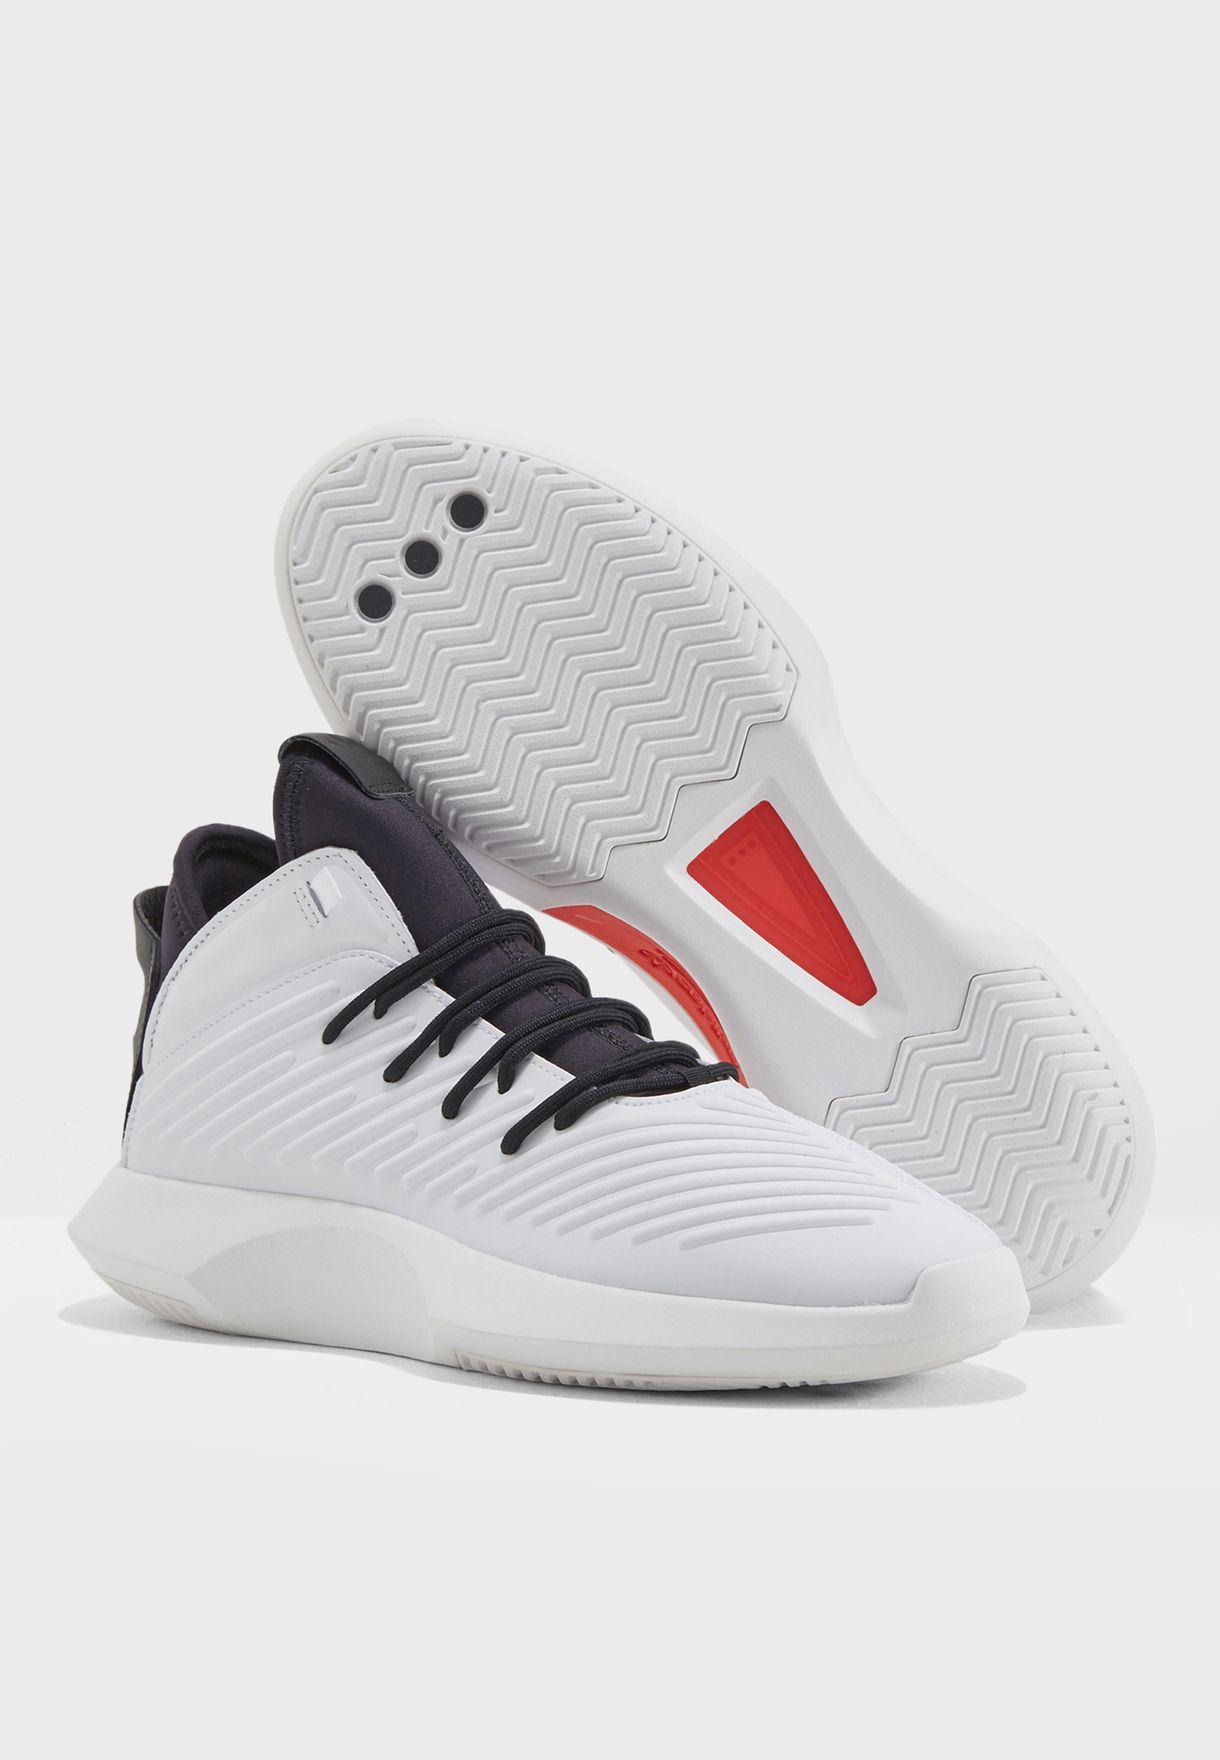 Shop adidas Originals white Crazy 1 ADV AQ0320 for Men in Qatar ... 55204b6f7